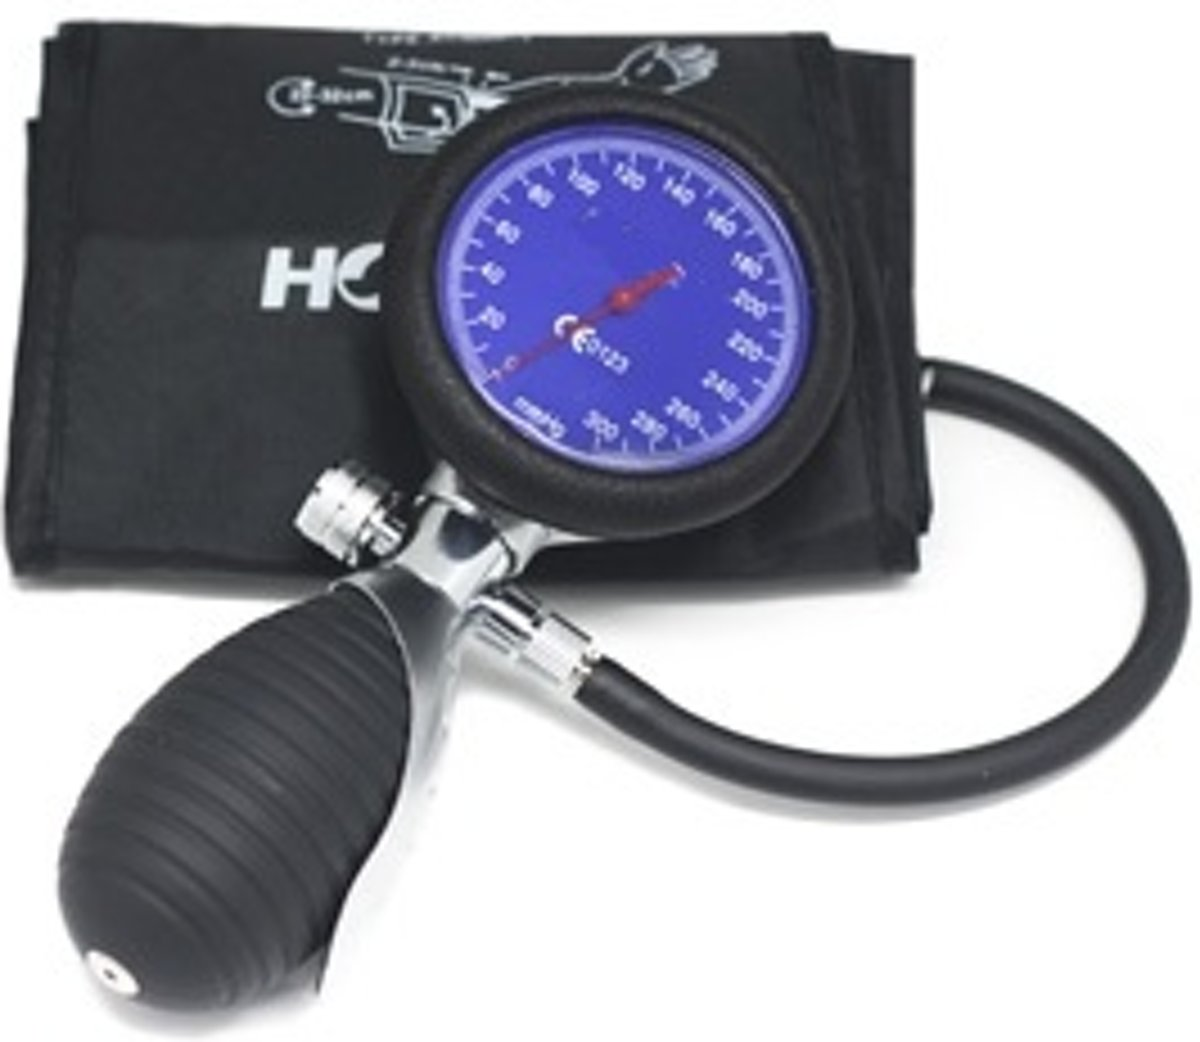 Handmatige bloeddrukmeter, high-end model ST-P56X II